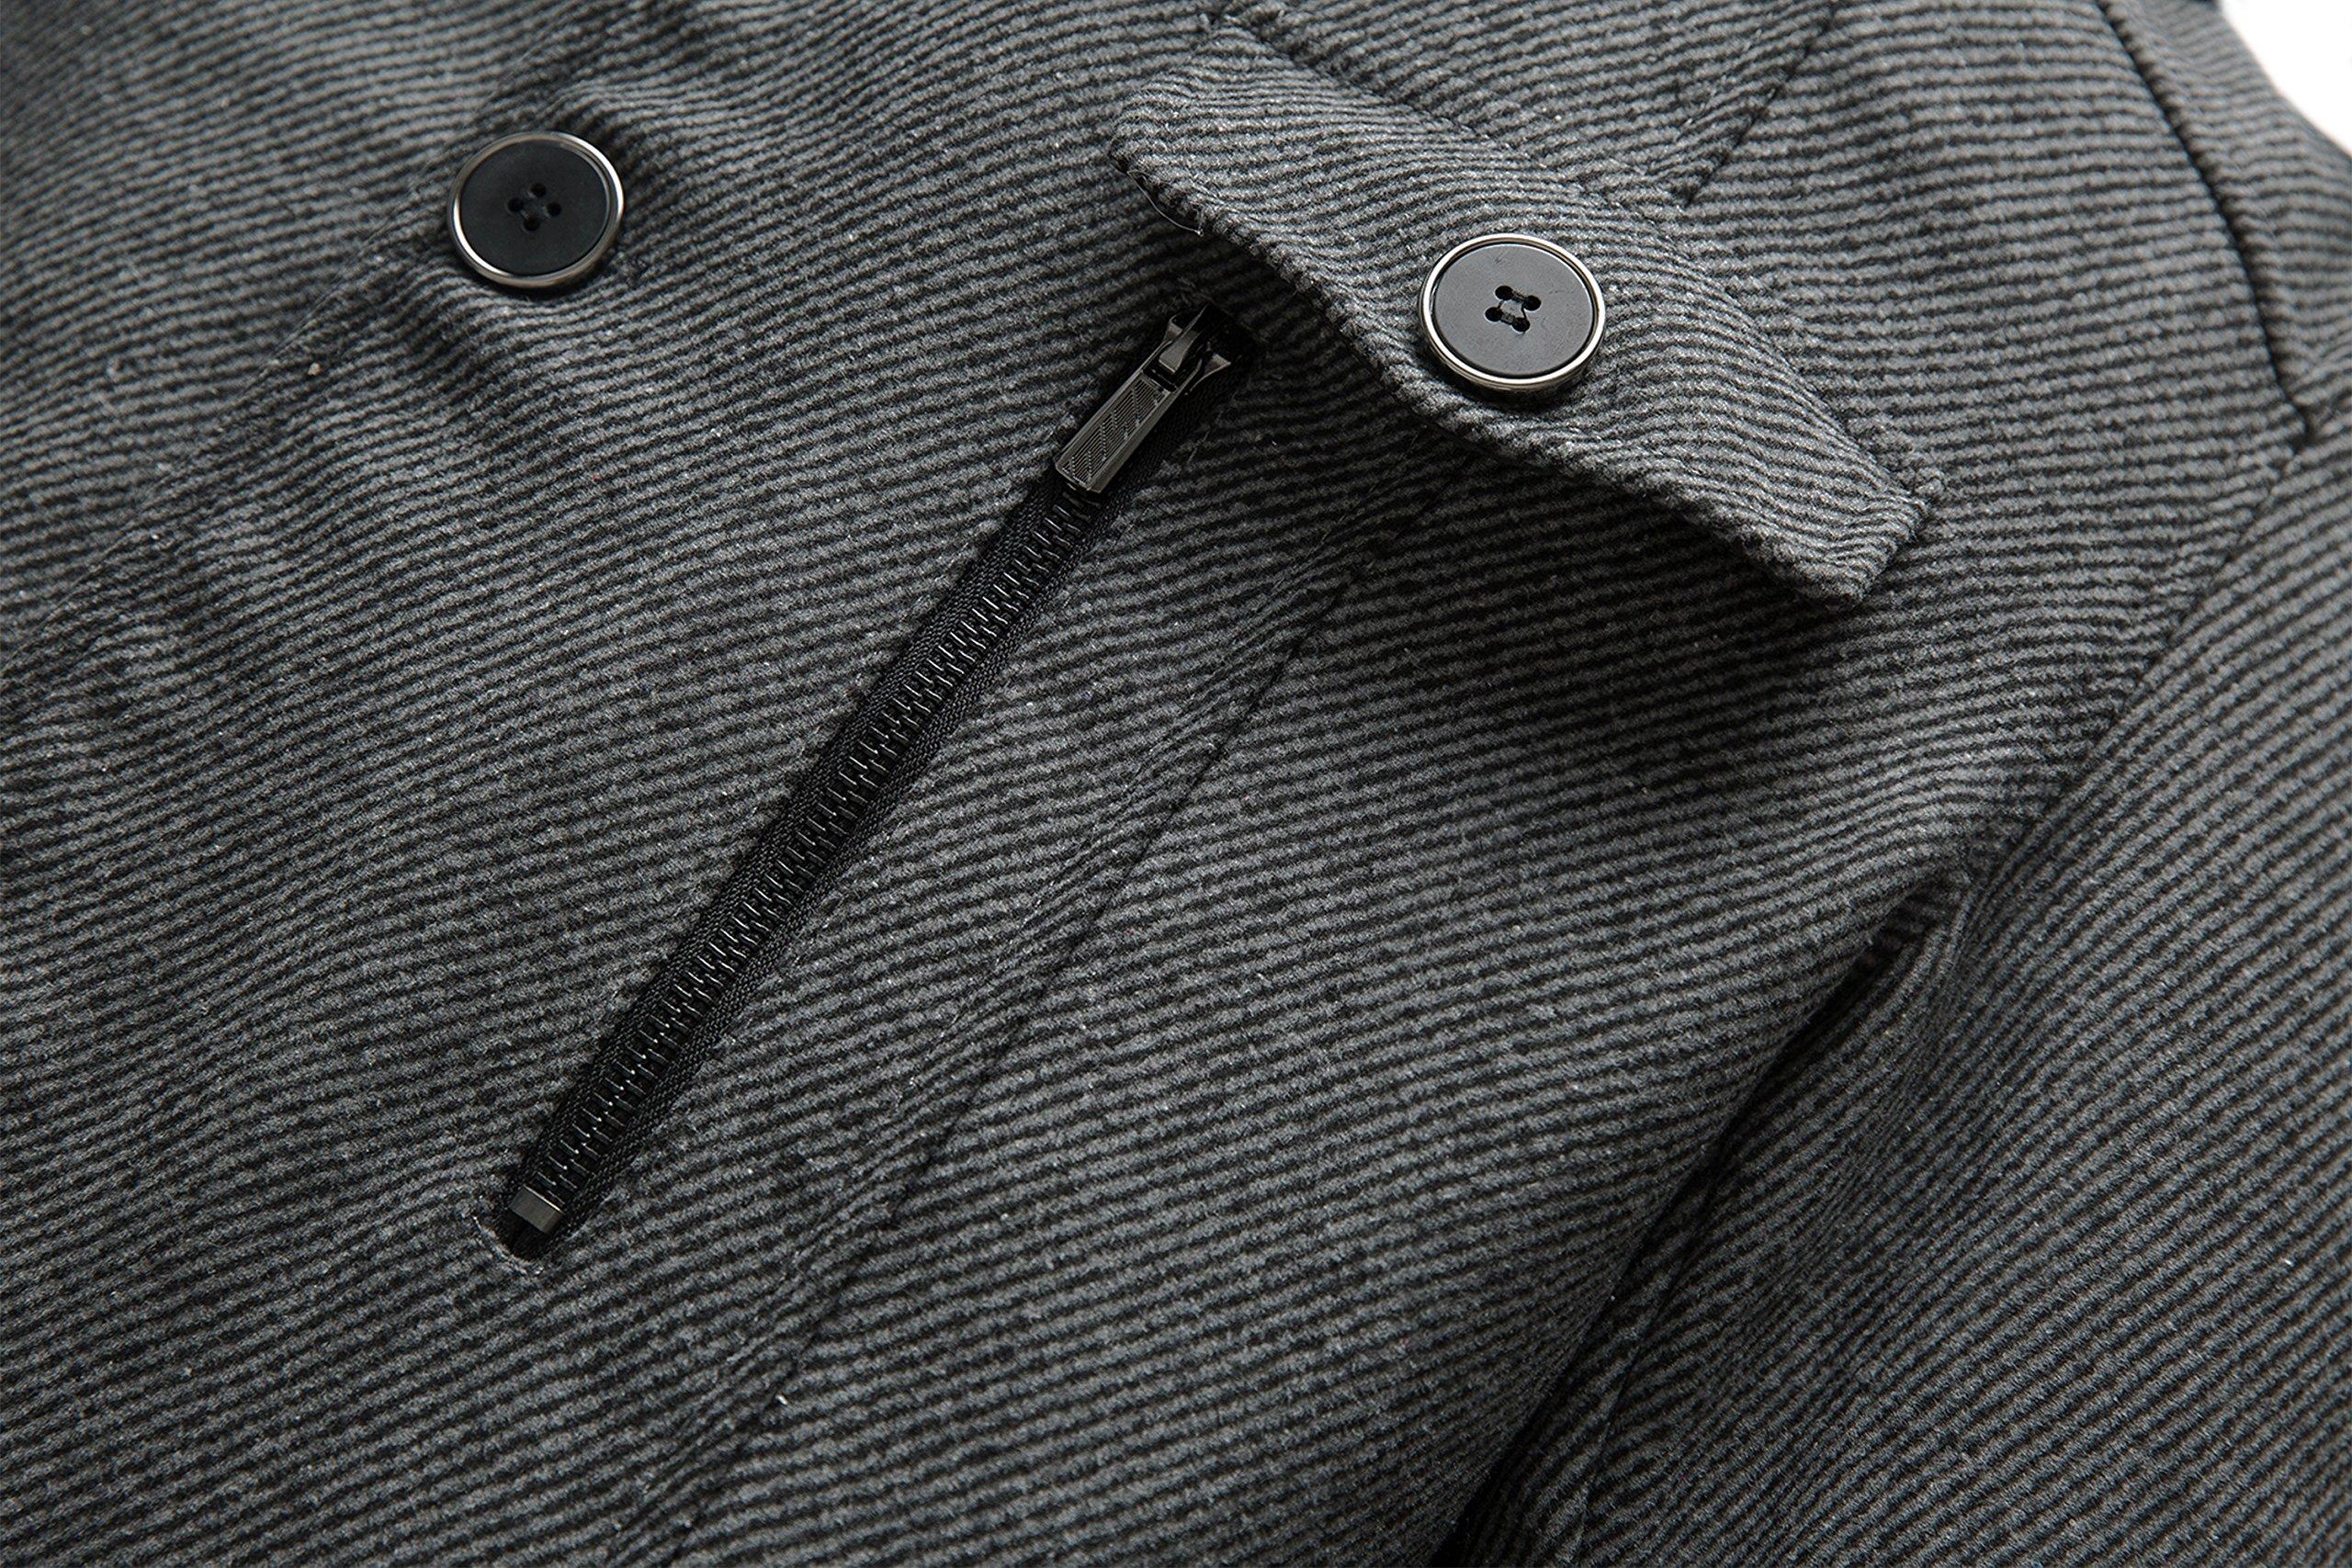 Wantdo Men's Wool Coat Stand Collar Windproof Jacket Overcoat Grey Large by Wantdo (Image #5)